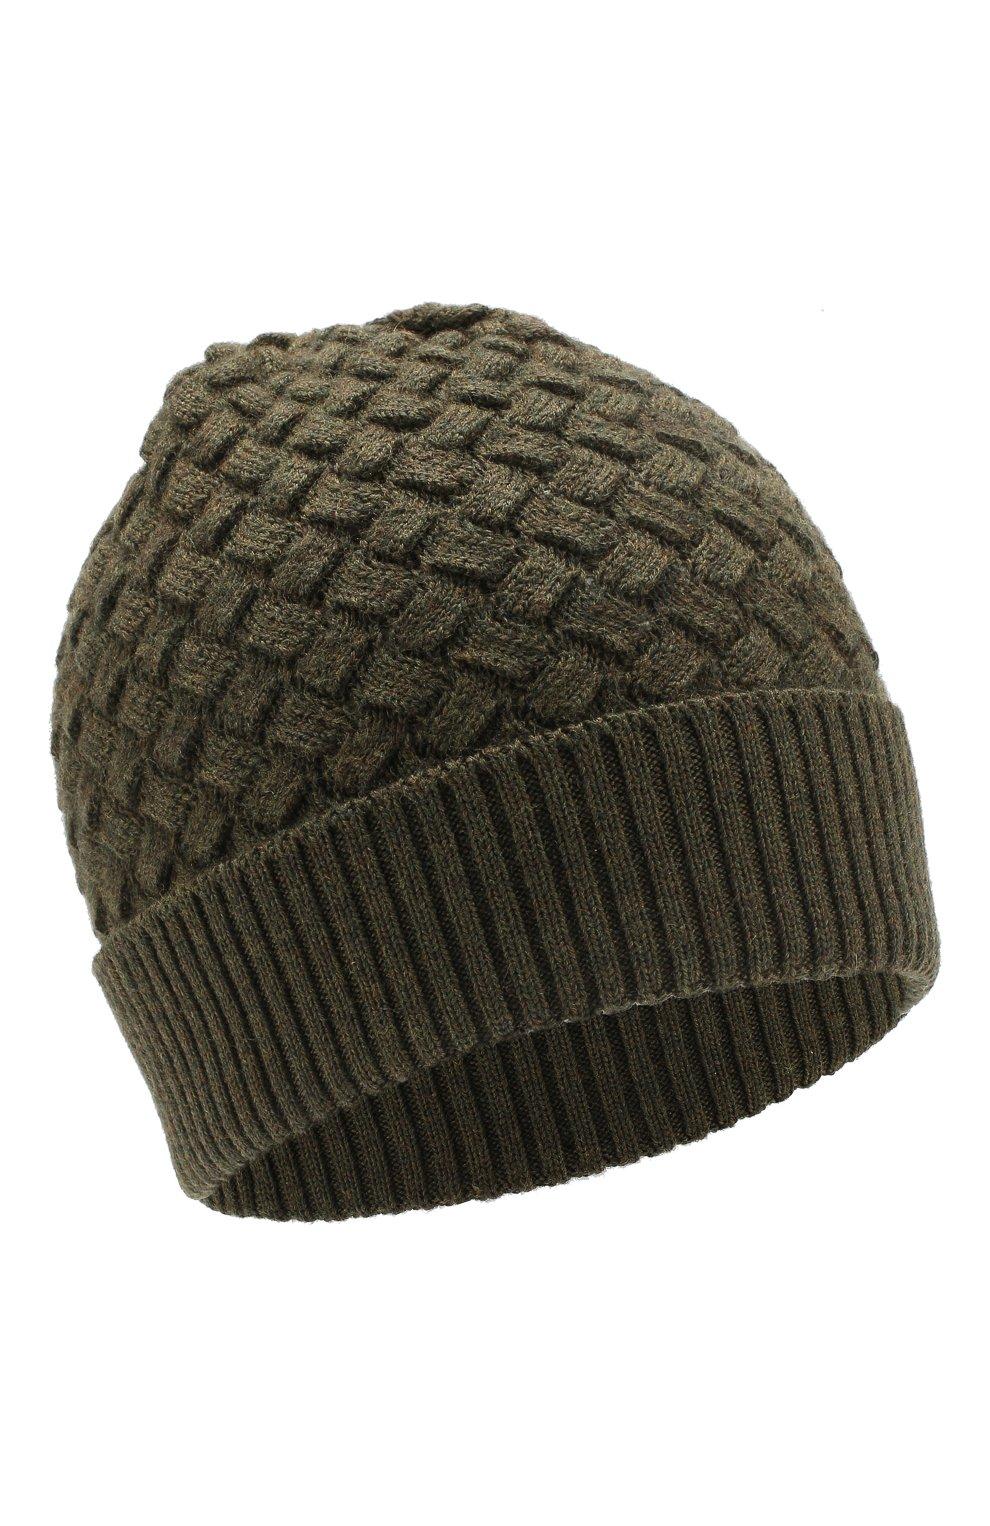 Женская шерстяная шапка BOTTEGA VENETA зеленого цвета, арт. 500396/4V206 | Фото 1